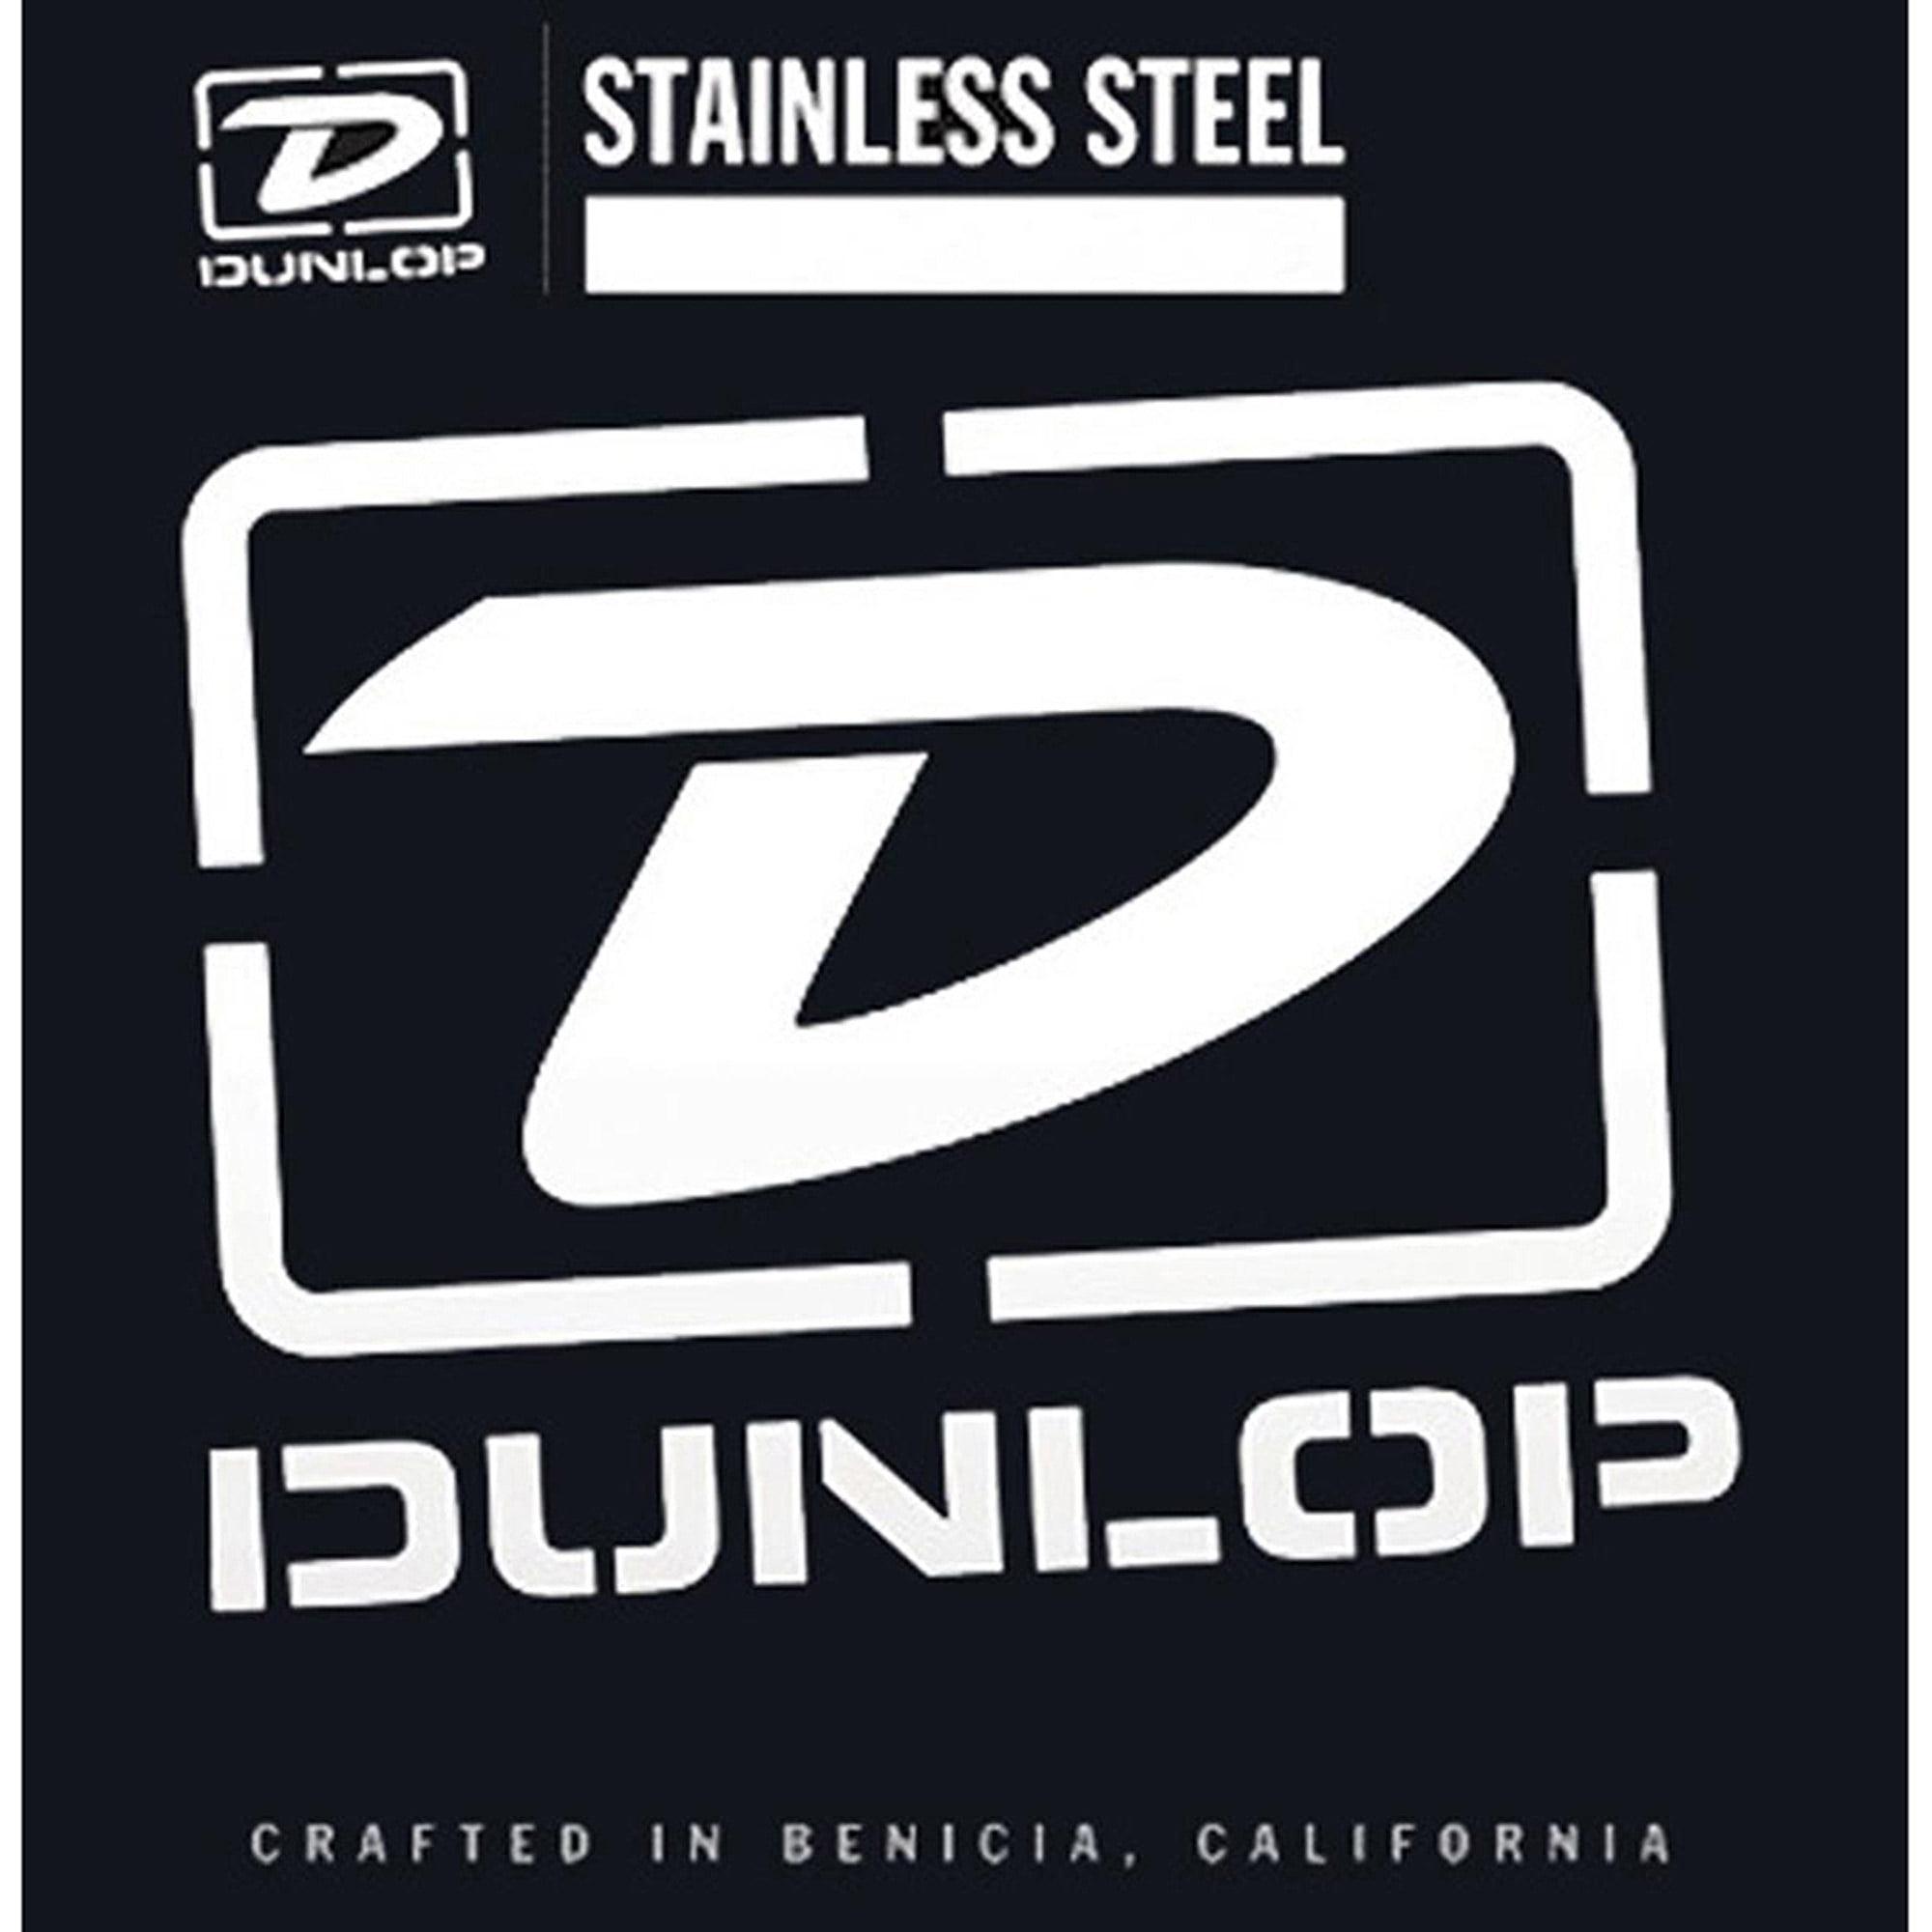 Dunlop - DBSBN40100 - Super Bright Stainless Steel Bass 4 String Set - .40-.100